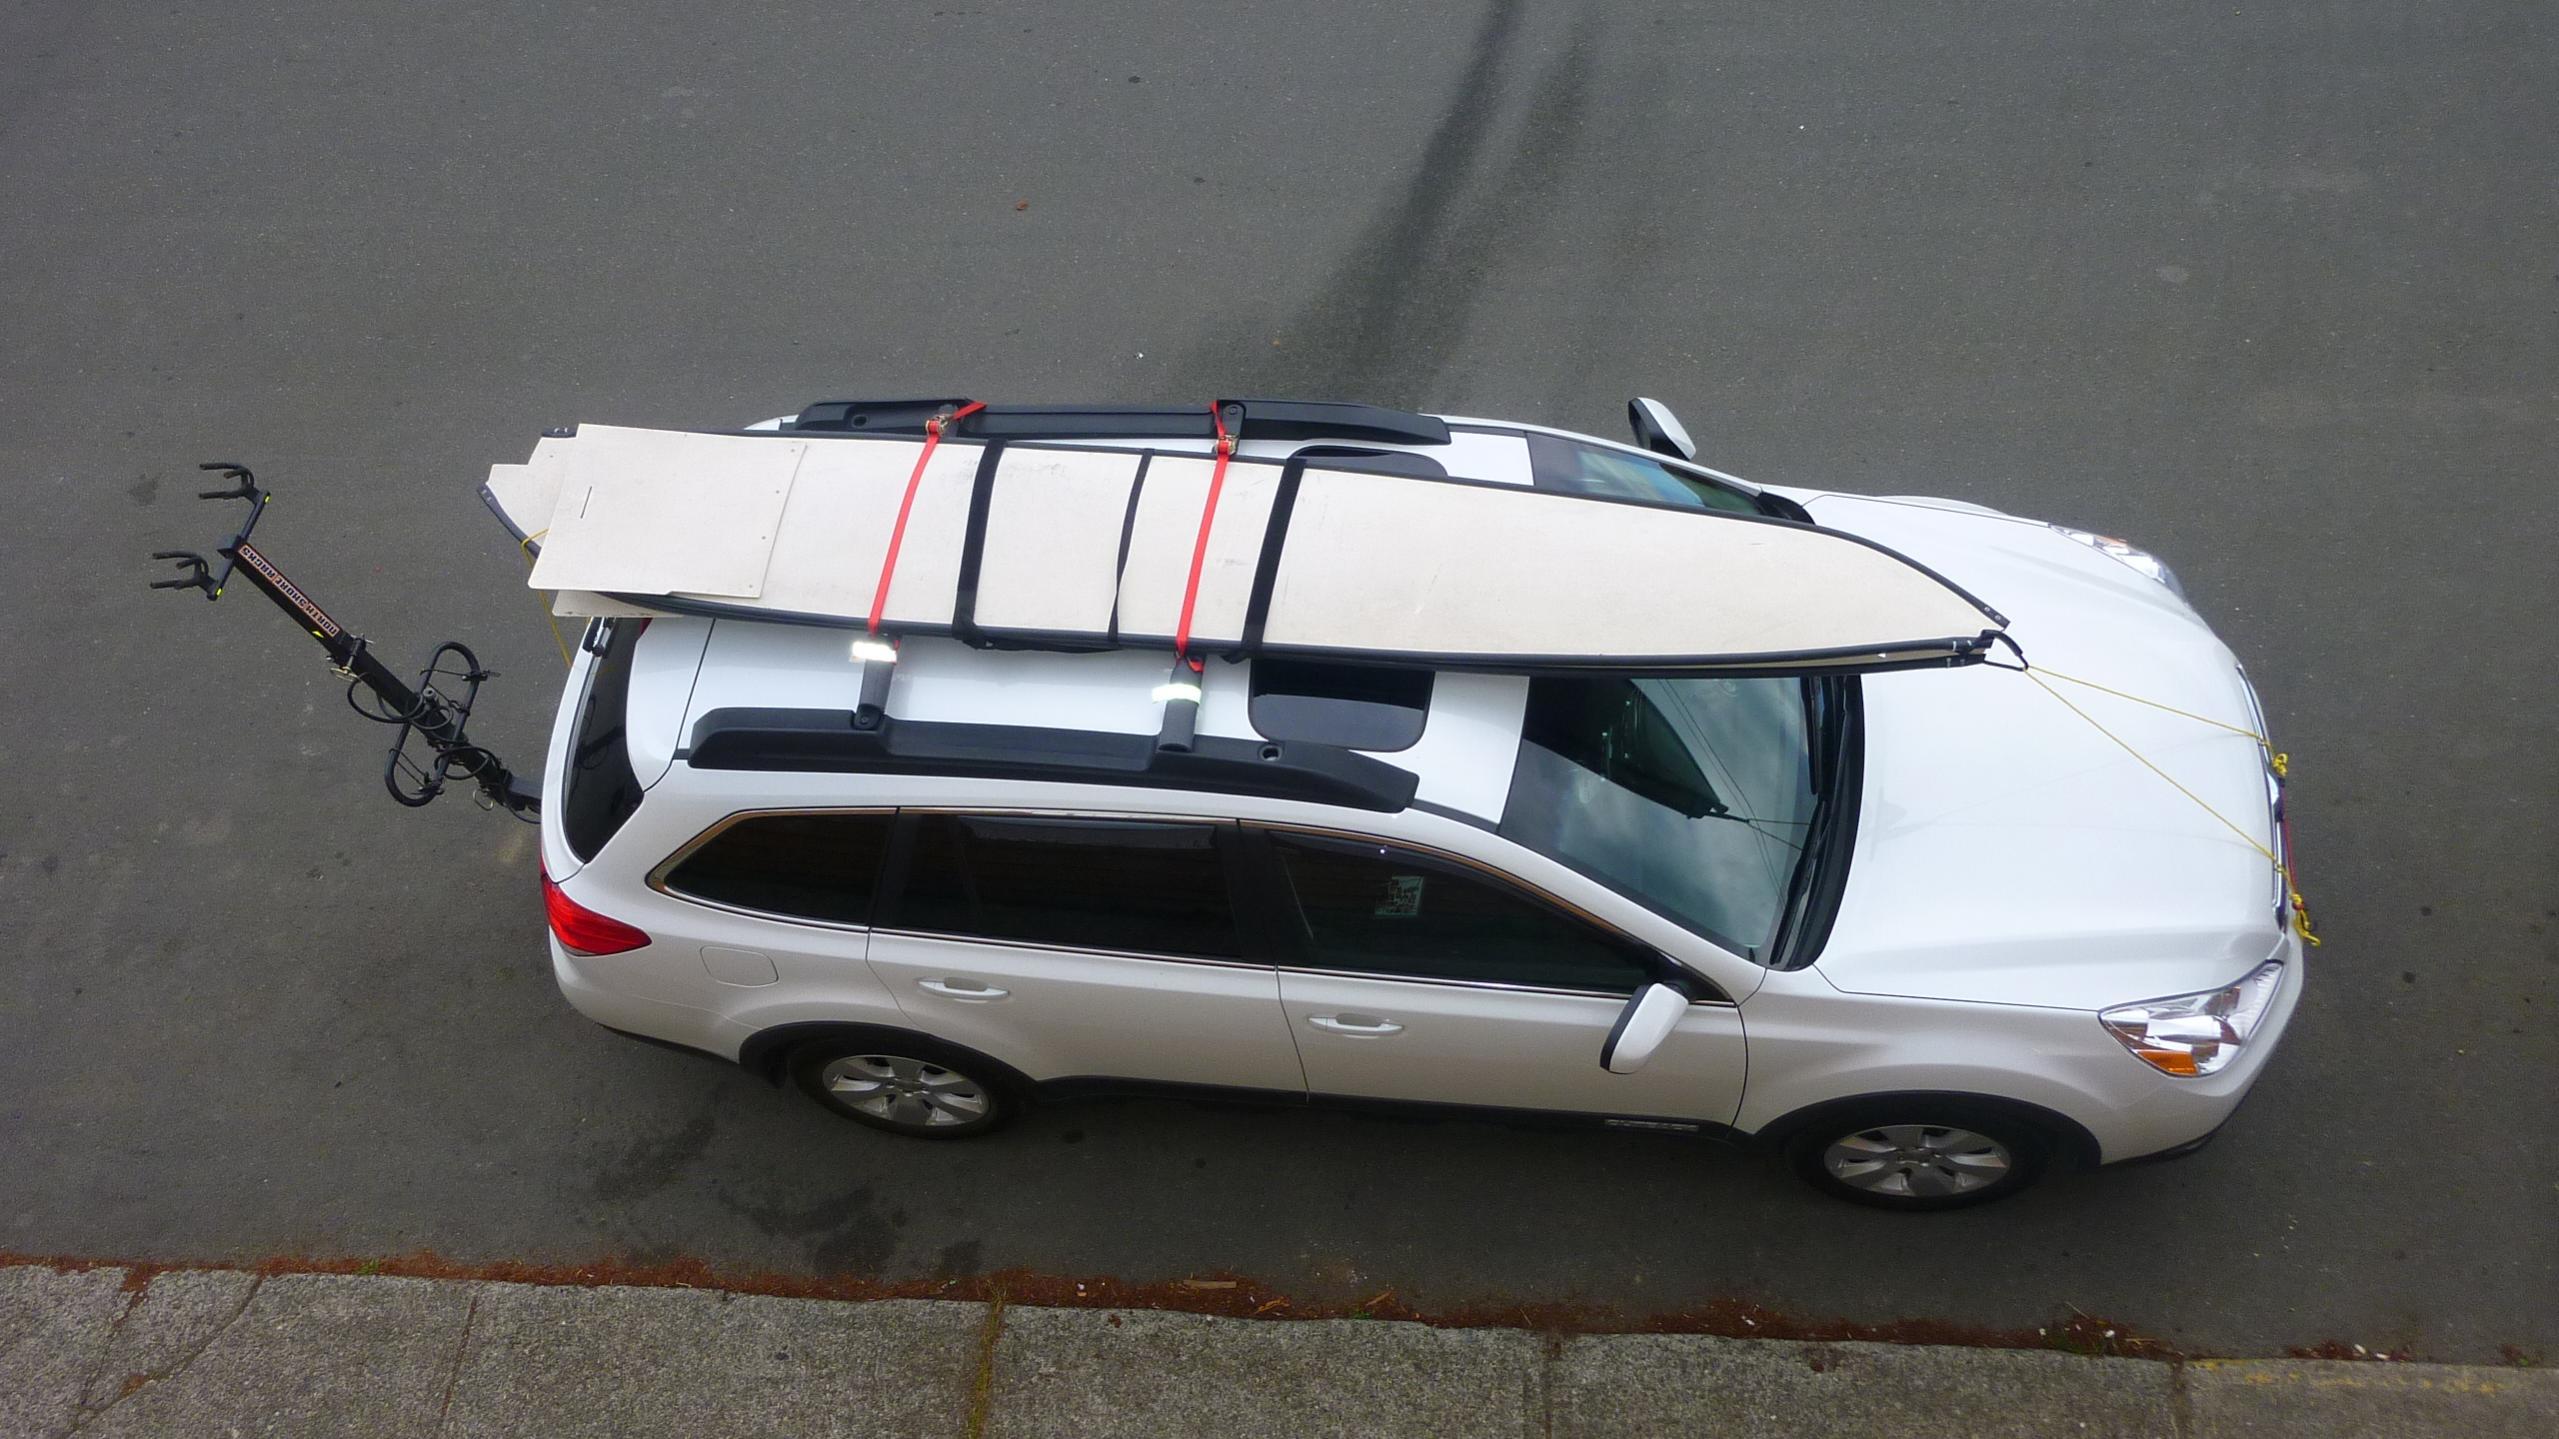 2017 Subaru Outback Roof Rack Problem - Racks Blog Ideas